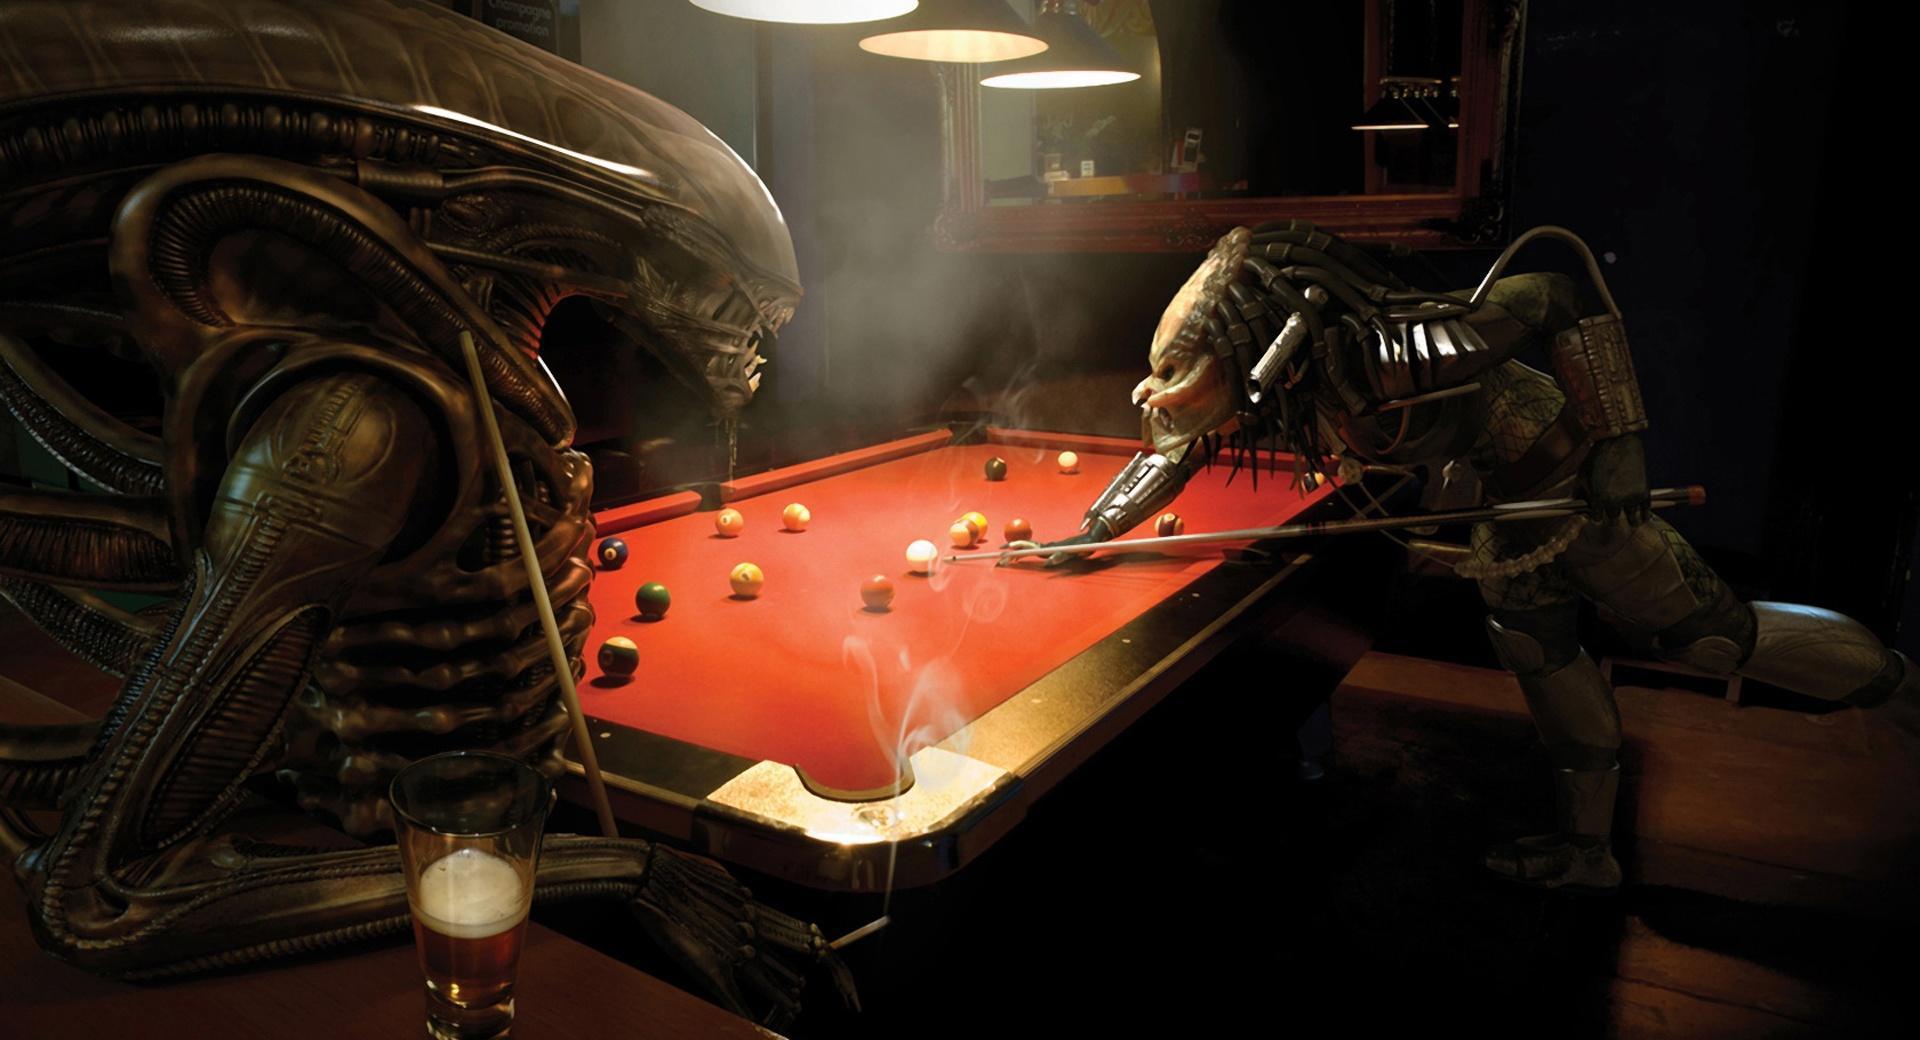 Alien Vs Predator, Pool wallpapers HD quality